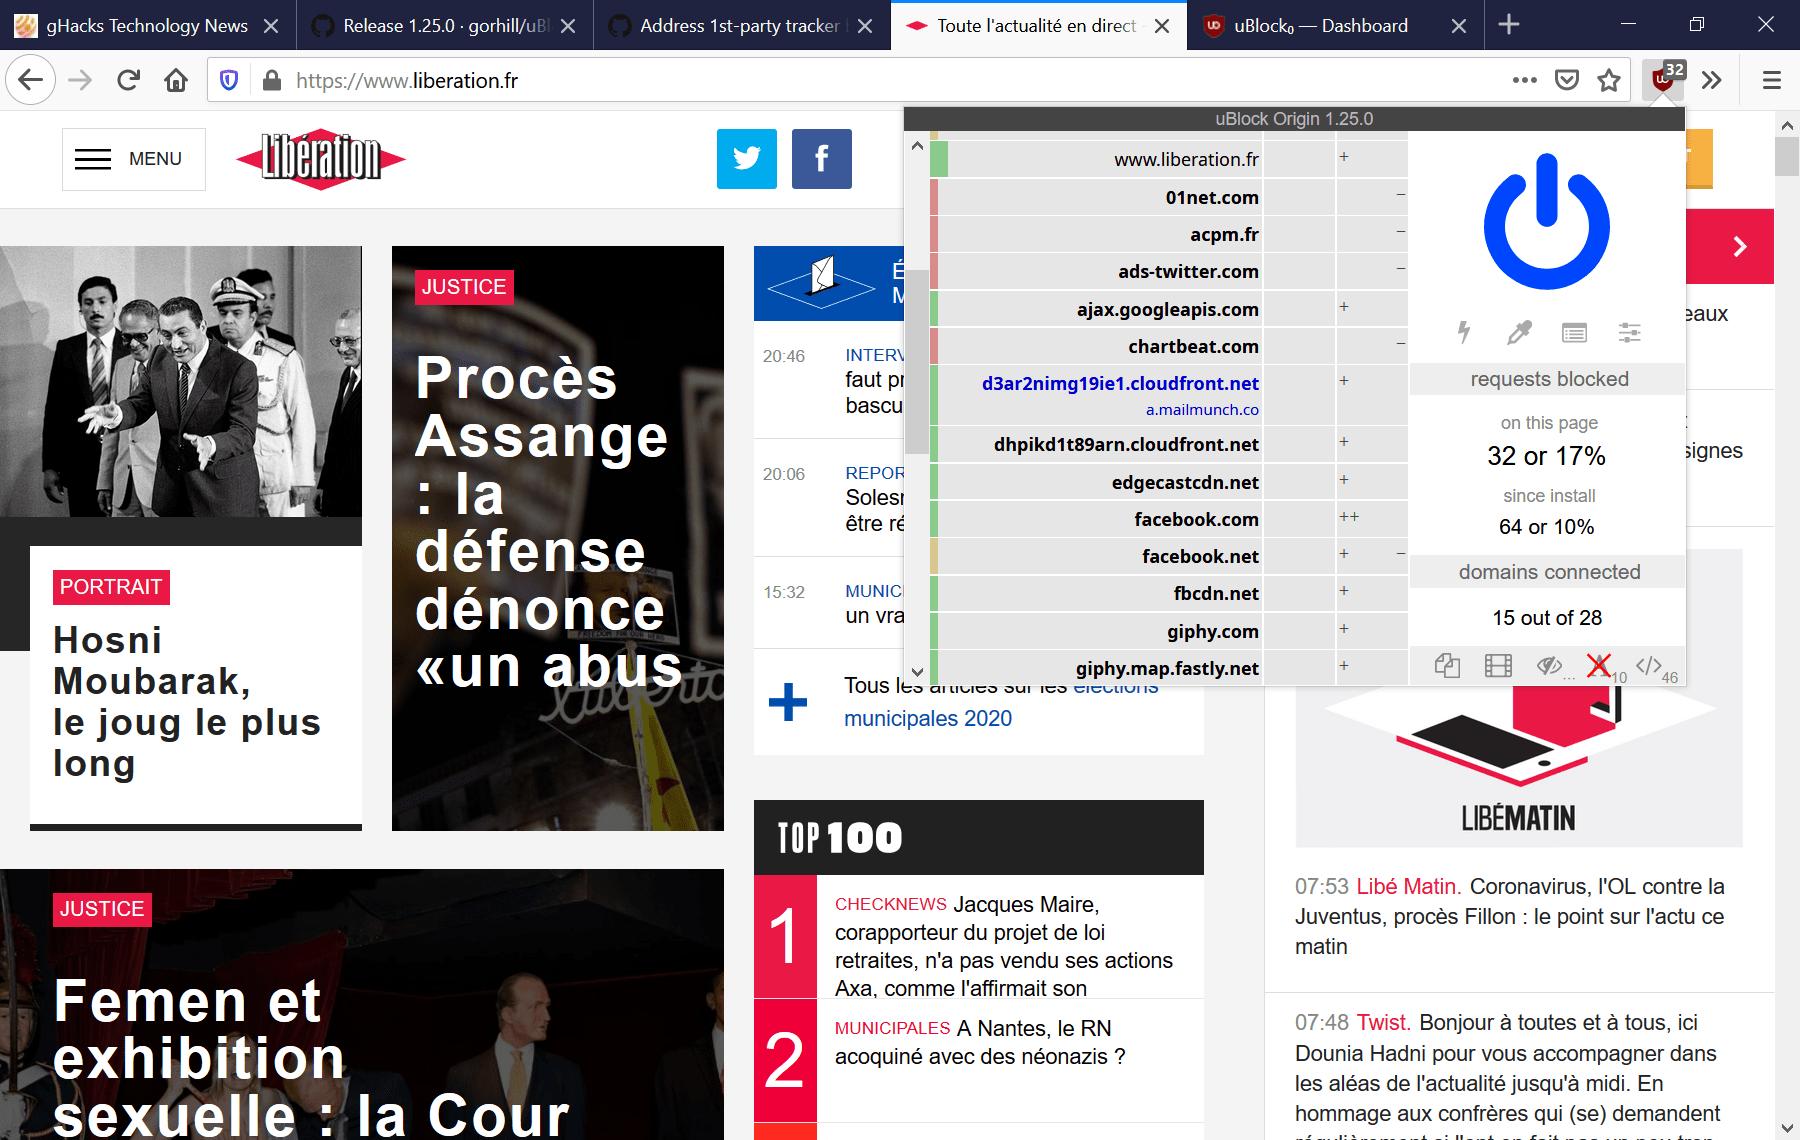 ublock origin firefox chrome ad blocker